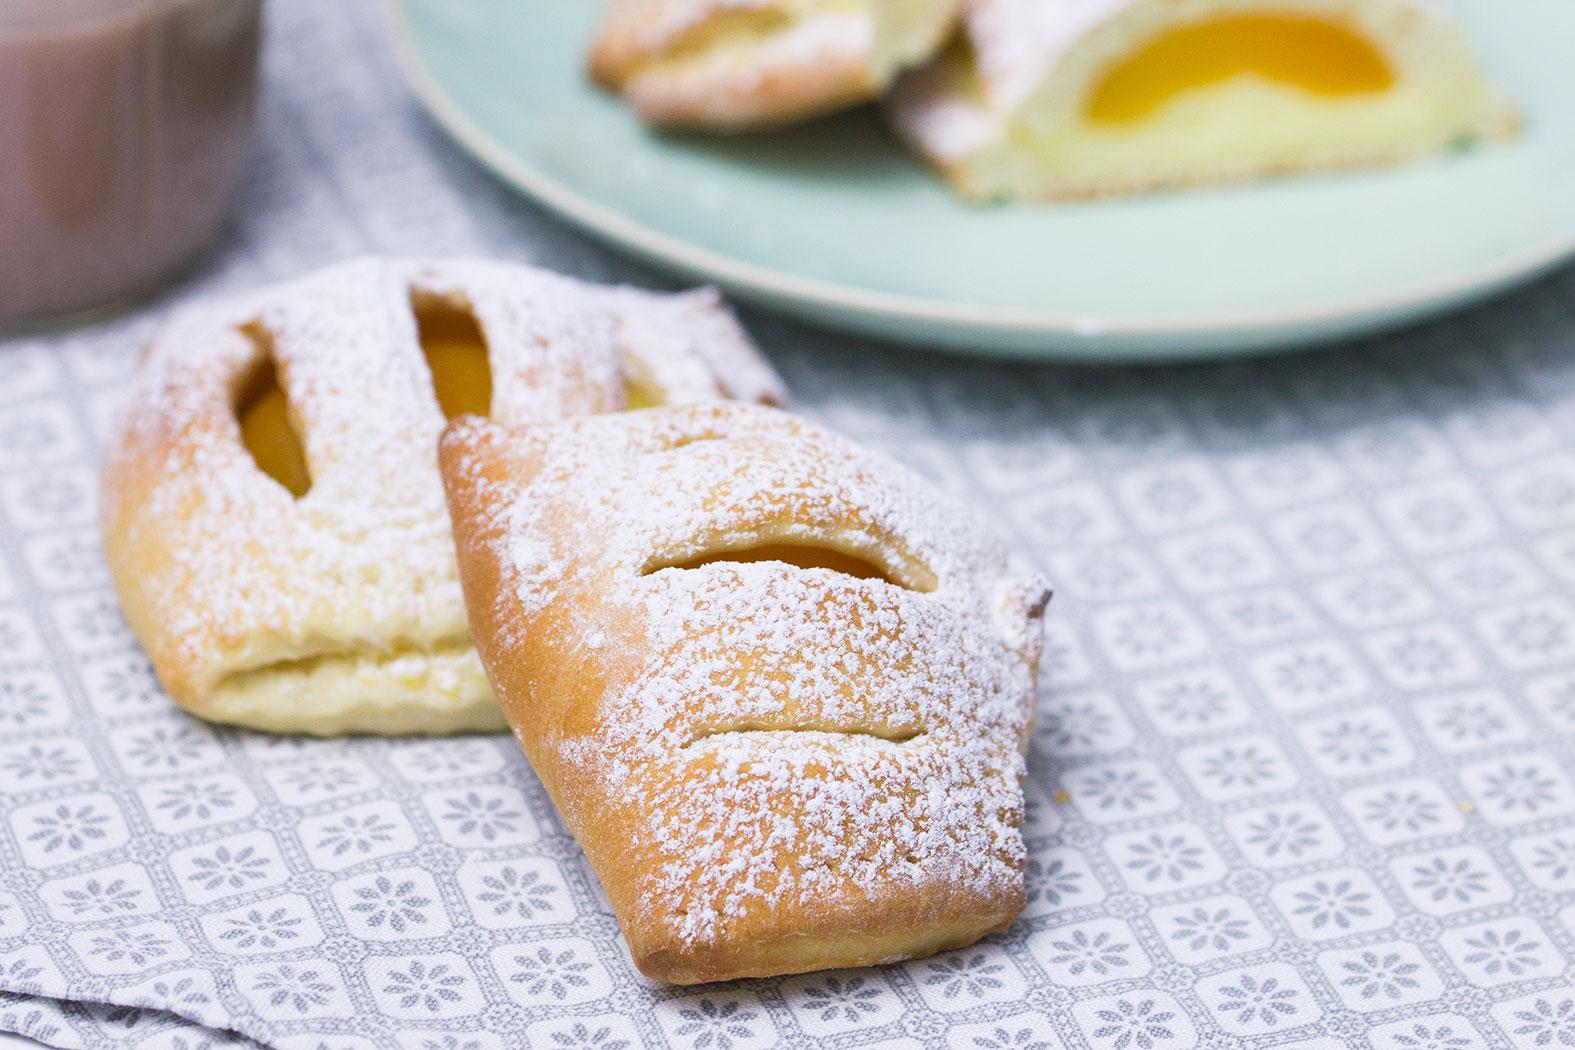 Aprikosen Vanillepudding Taschen Rezept Verzuckert Blogde